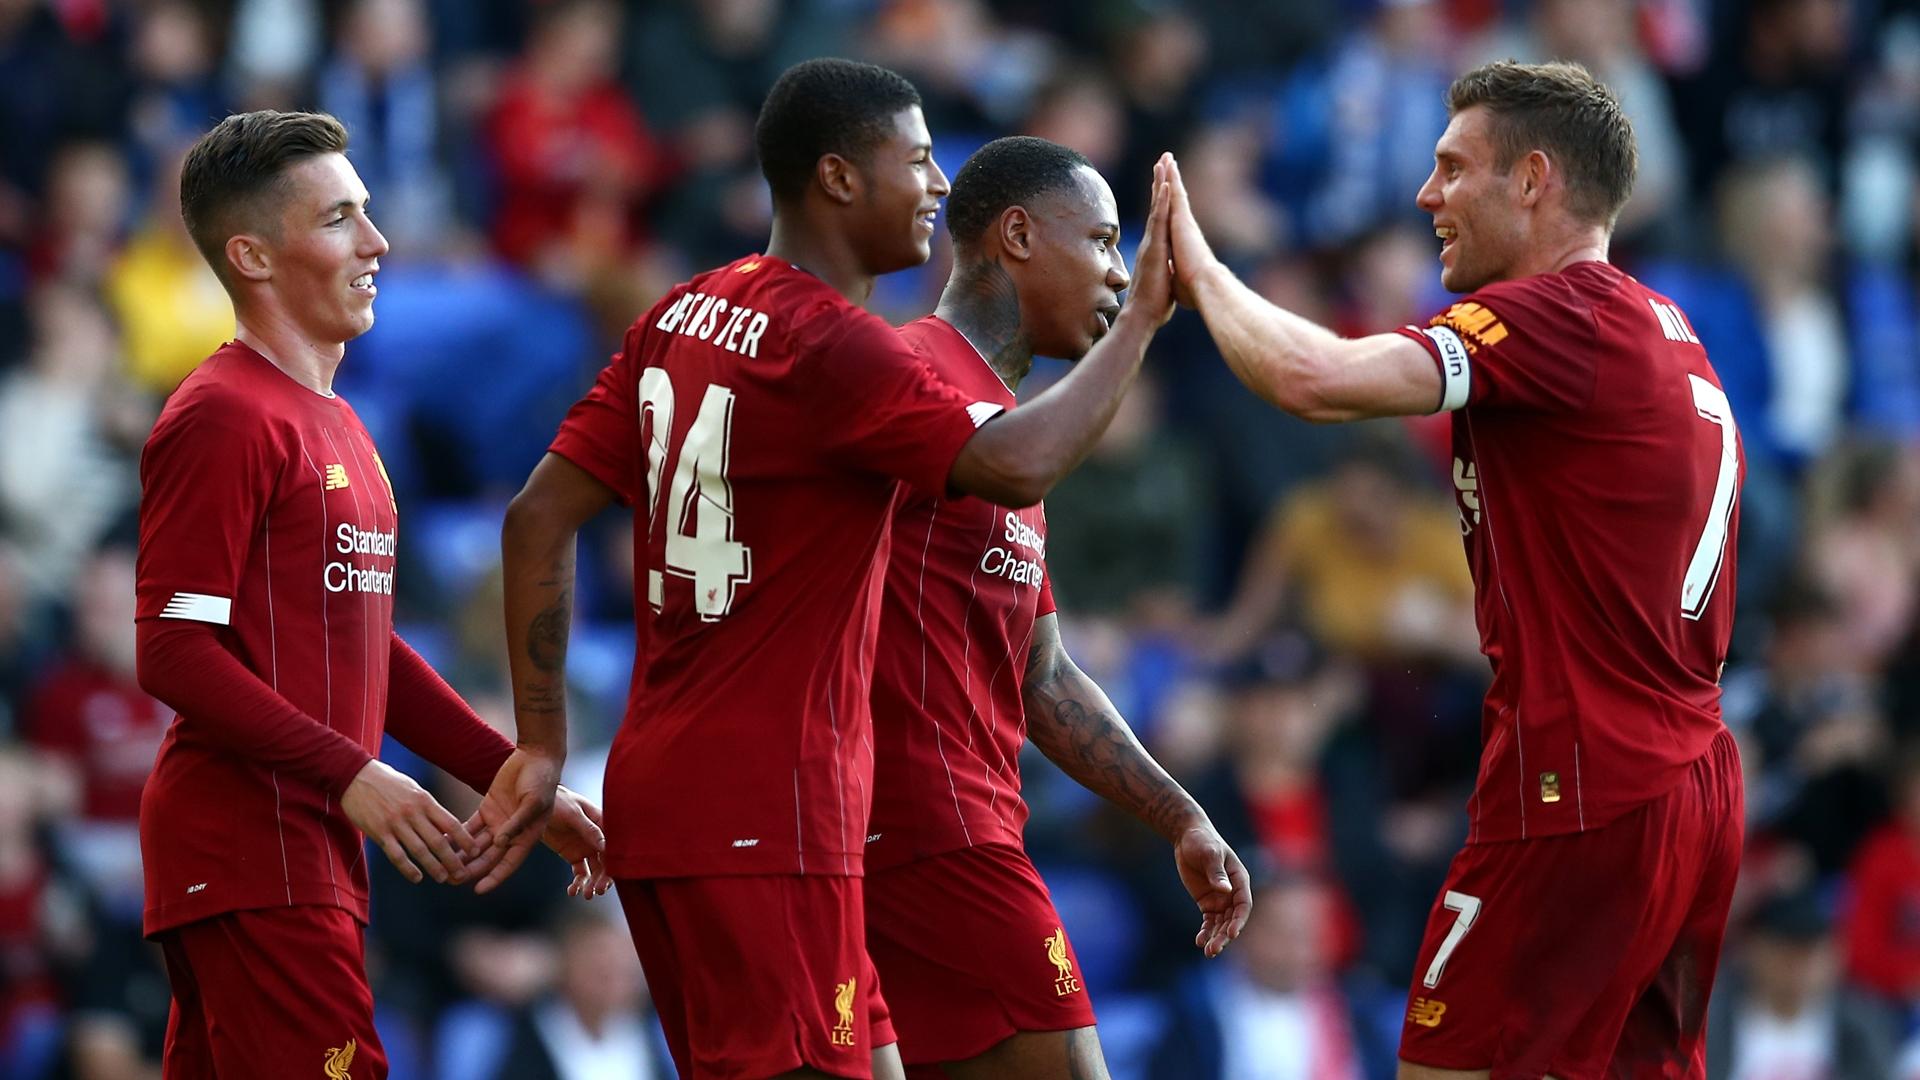 Bvb Liverpool Live Stream